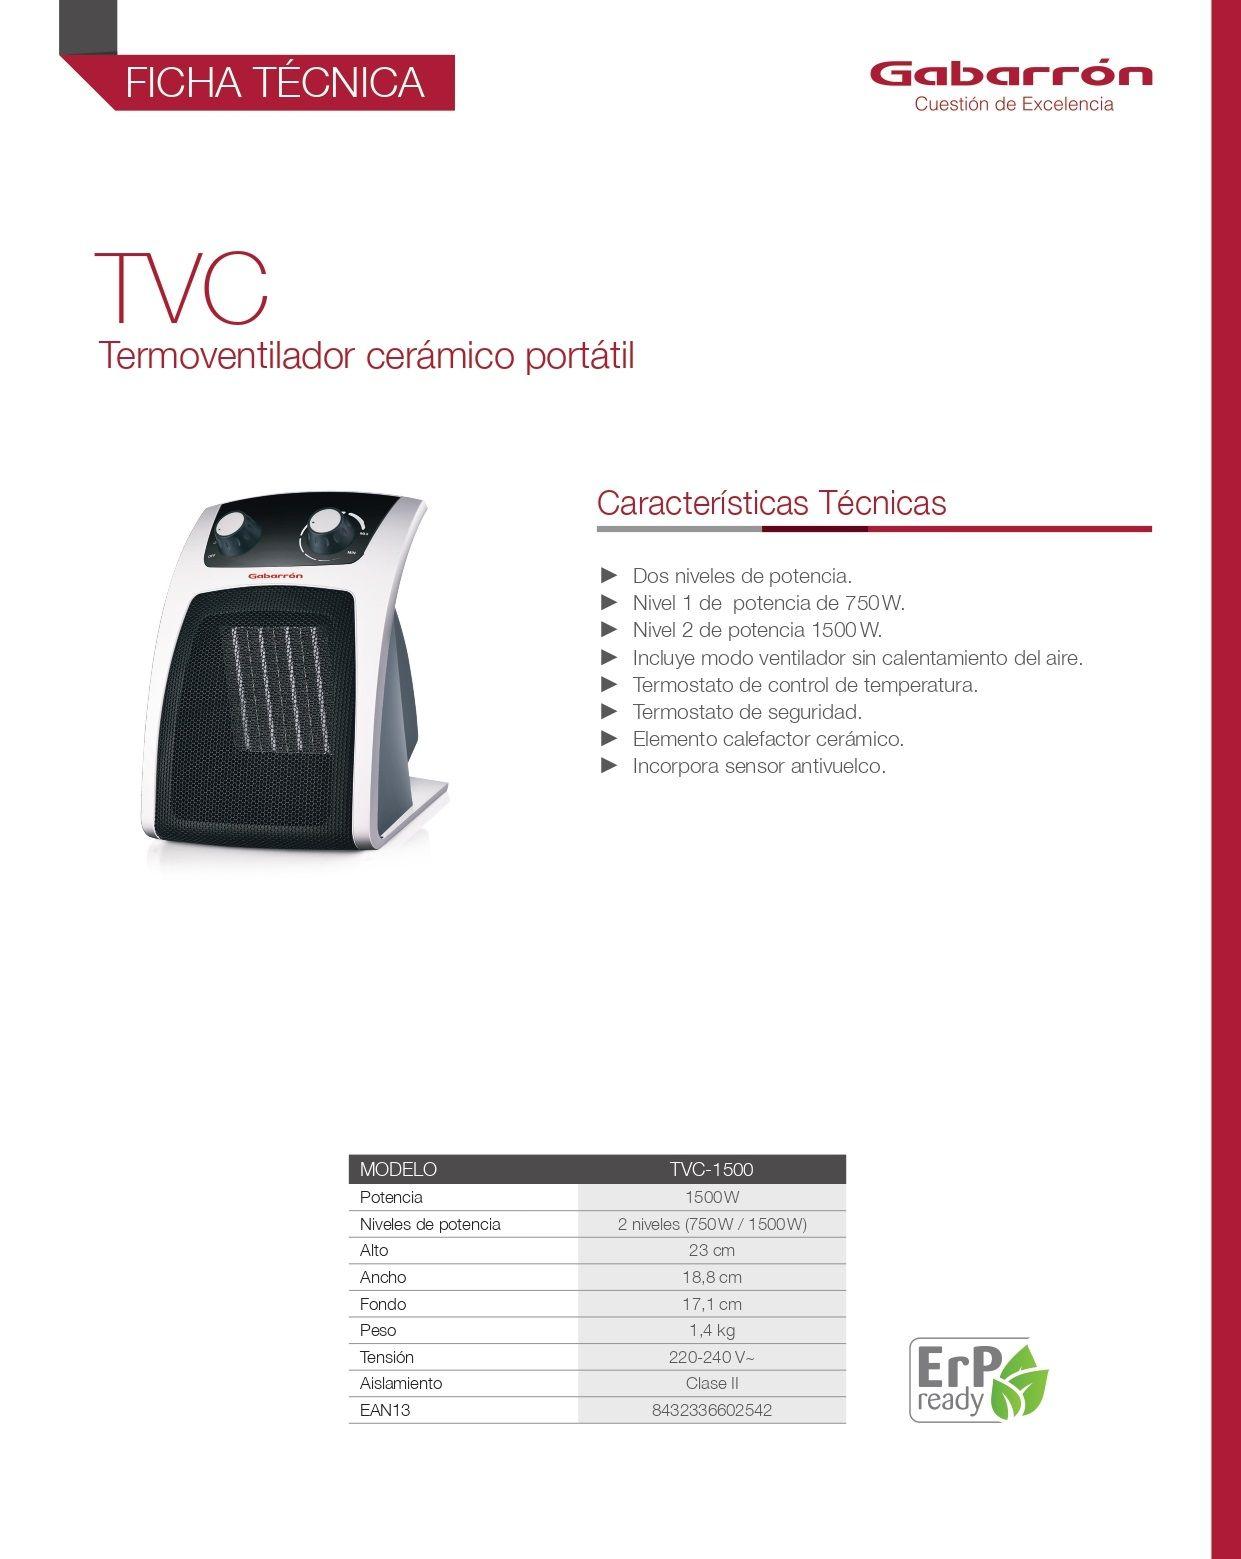 Termoventilador portátil Gabarron TVC